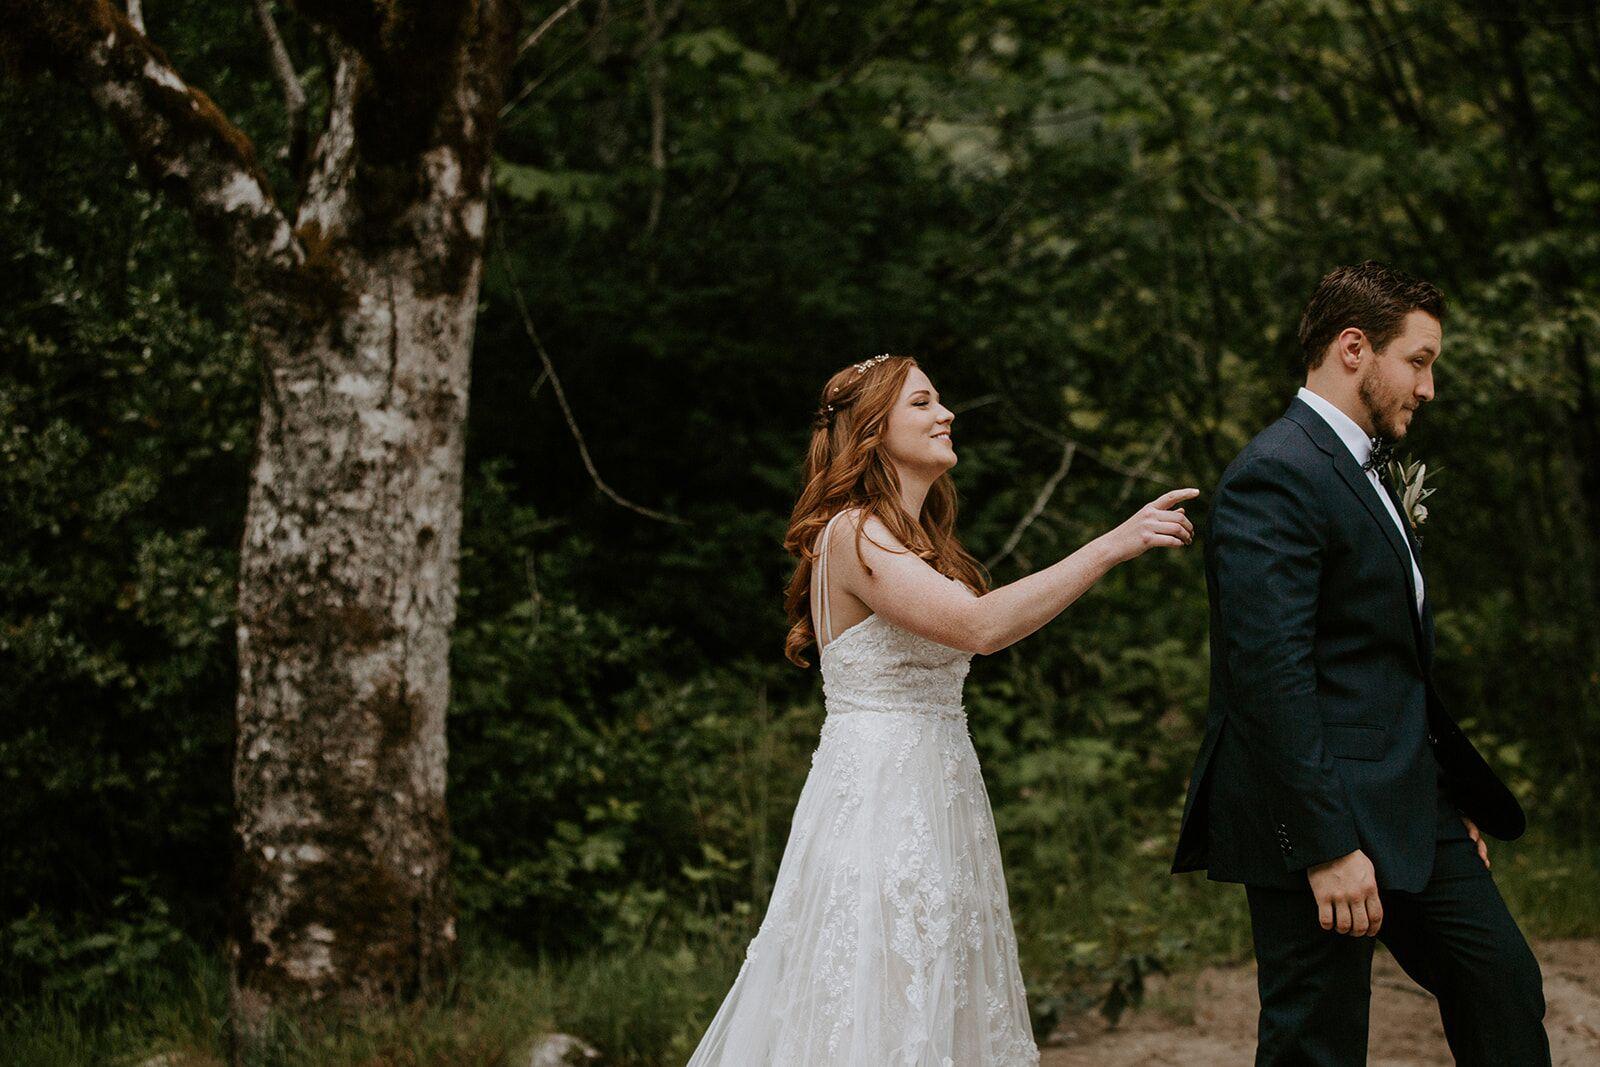 Blue-Sky-Ranch-Wedding-Block-Weddings-and-Events10.jpeg